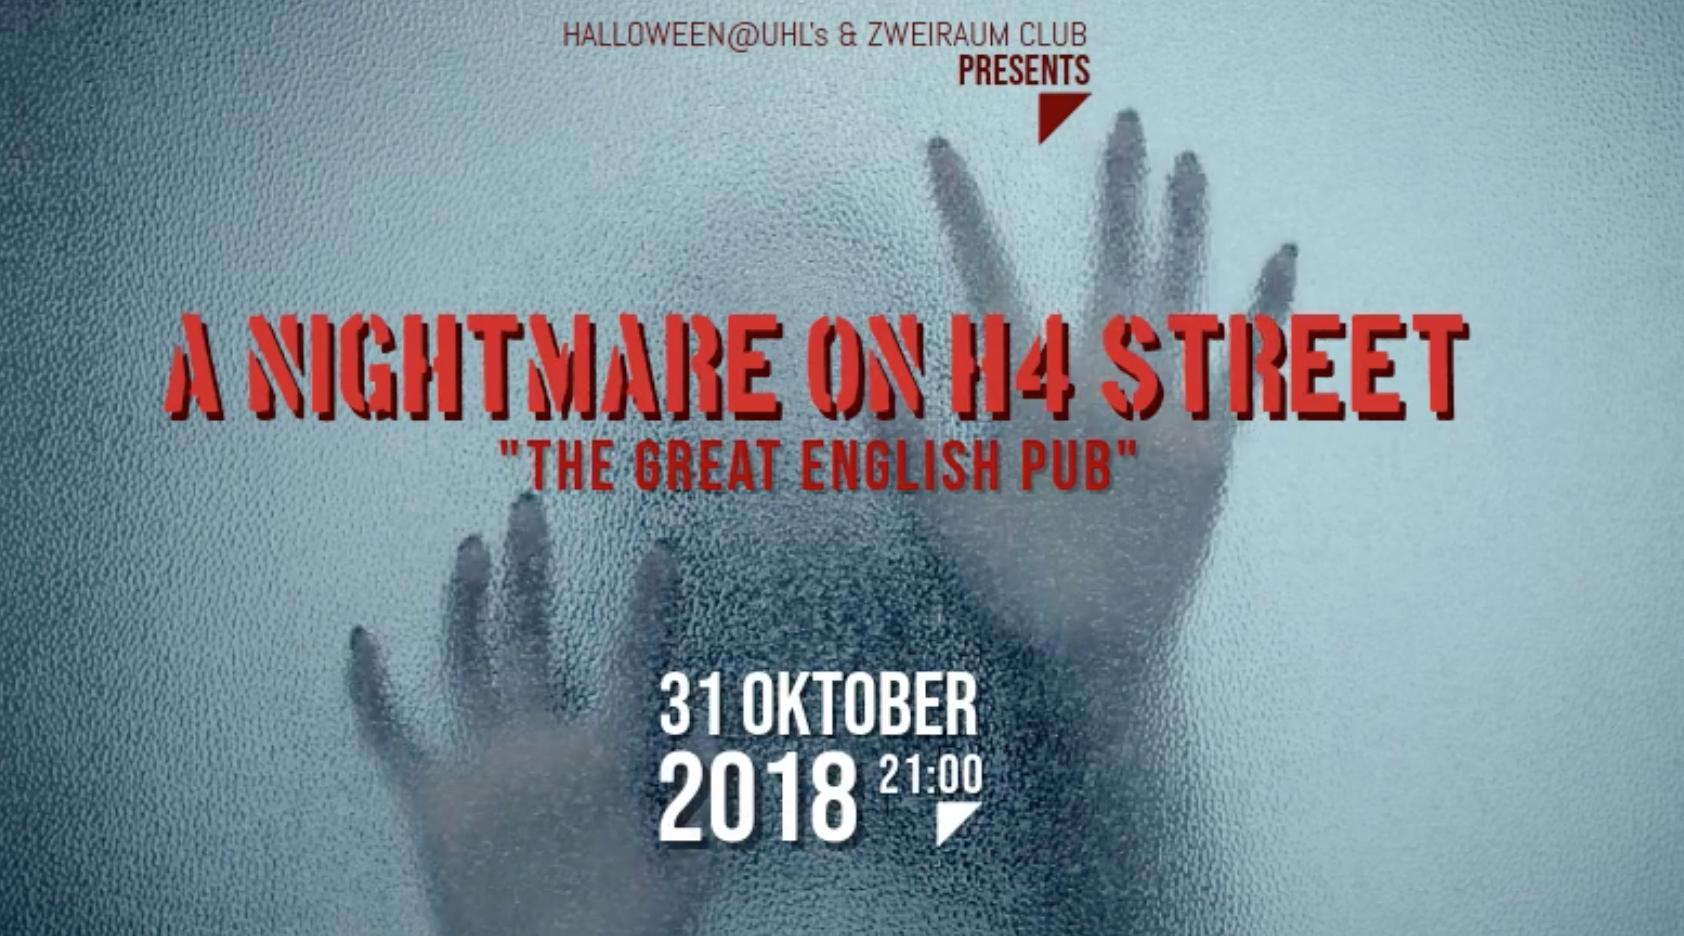 A NIGHTMARE ON H4 STREET